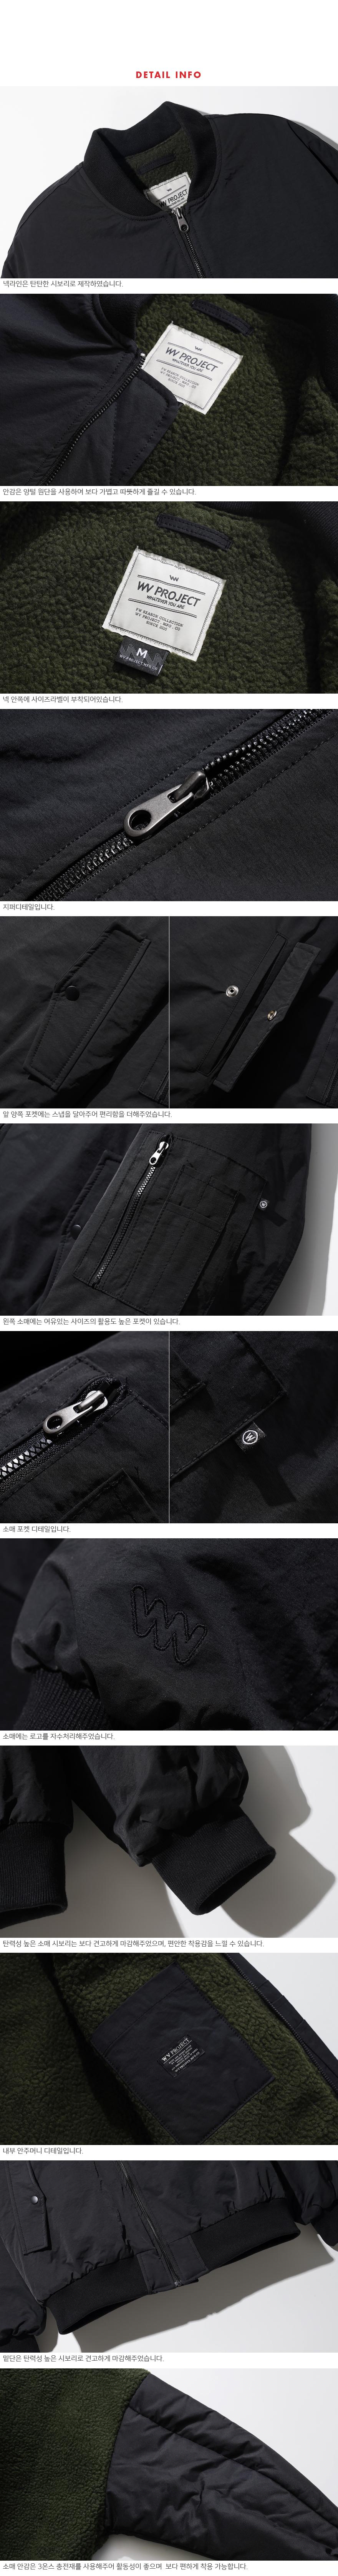 MJOT7413_detail_black_mj.jpg